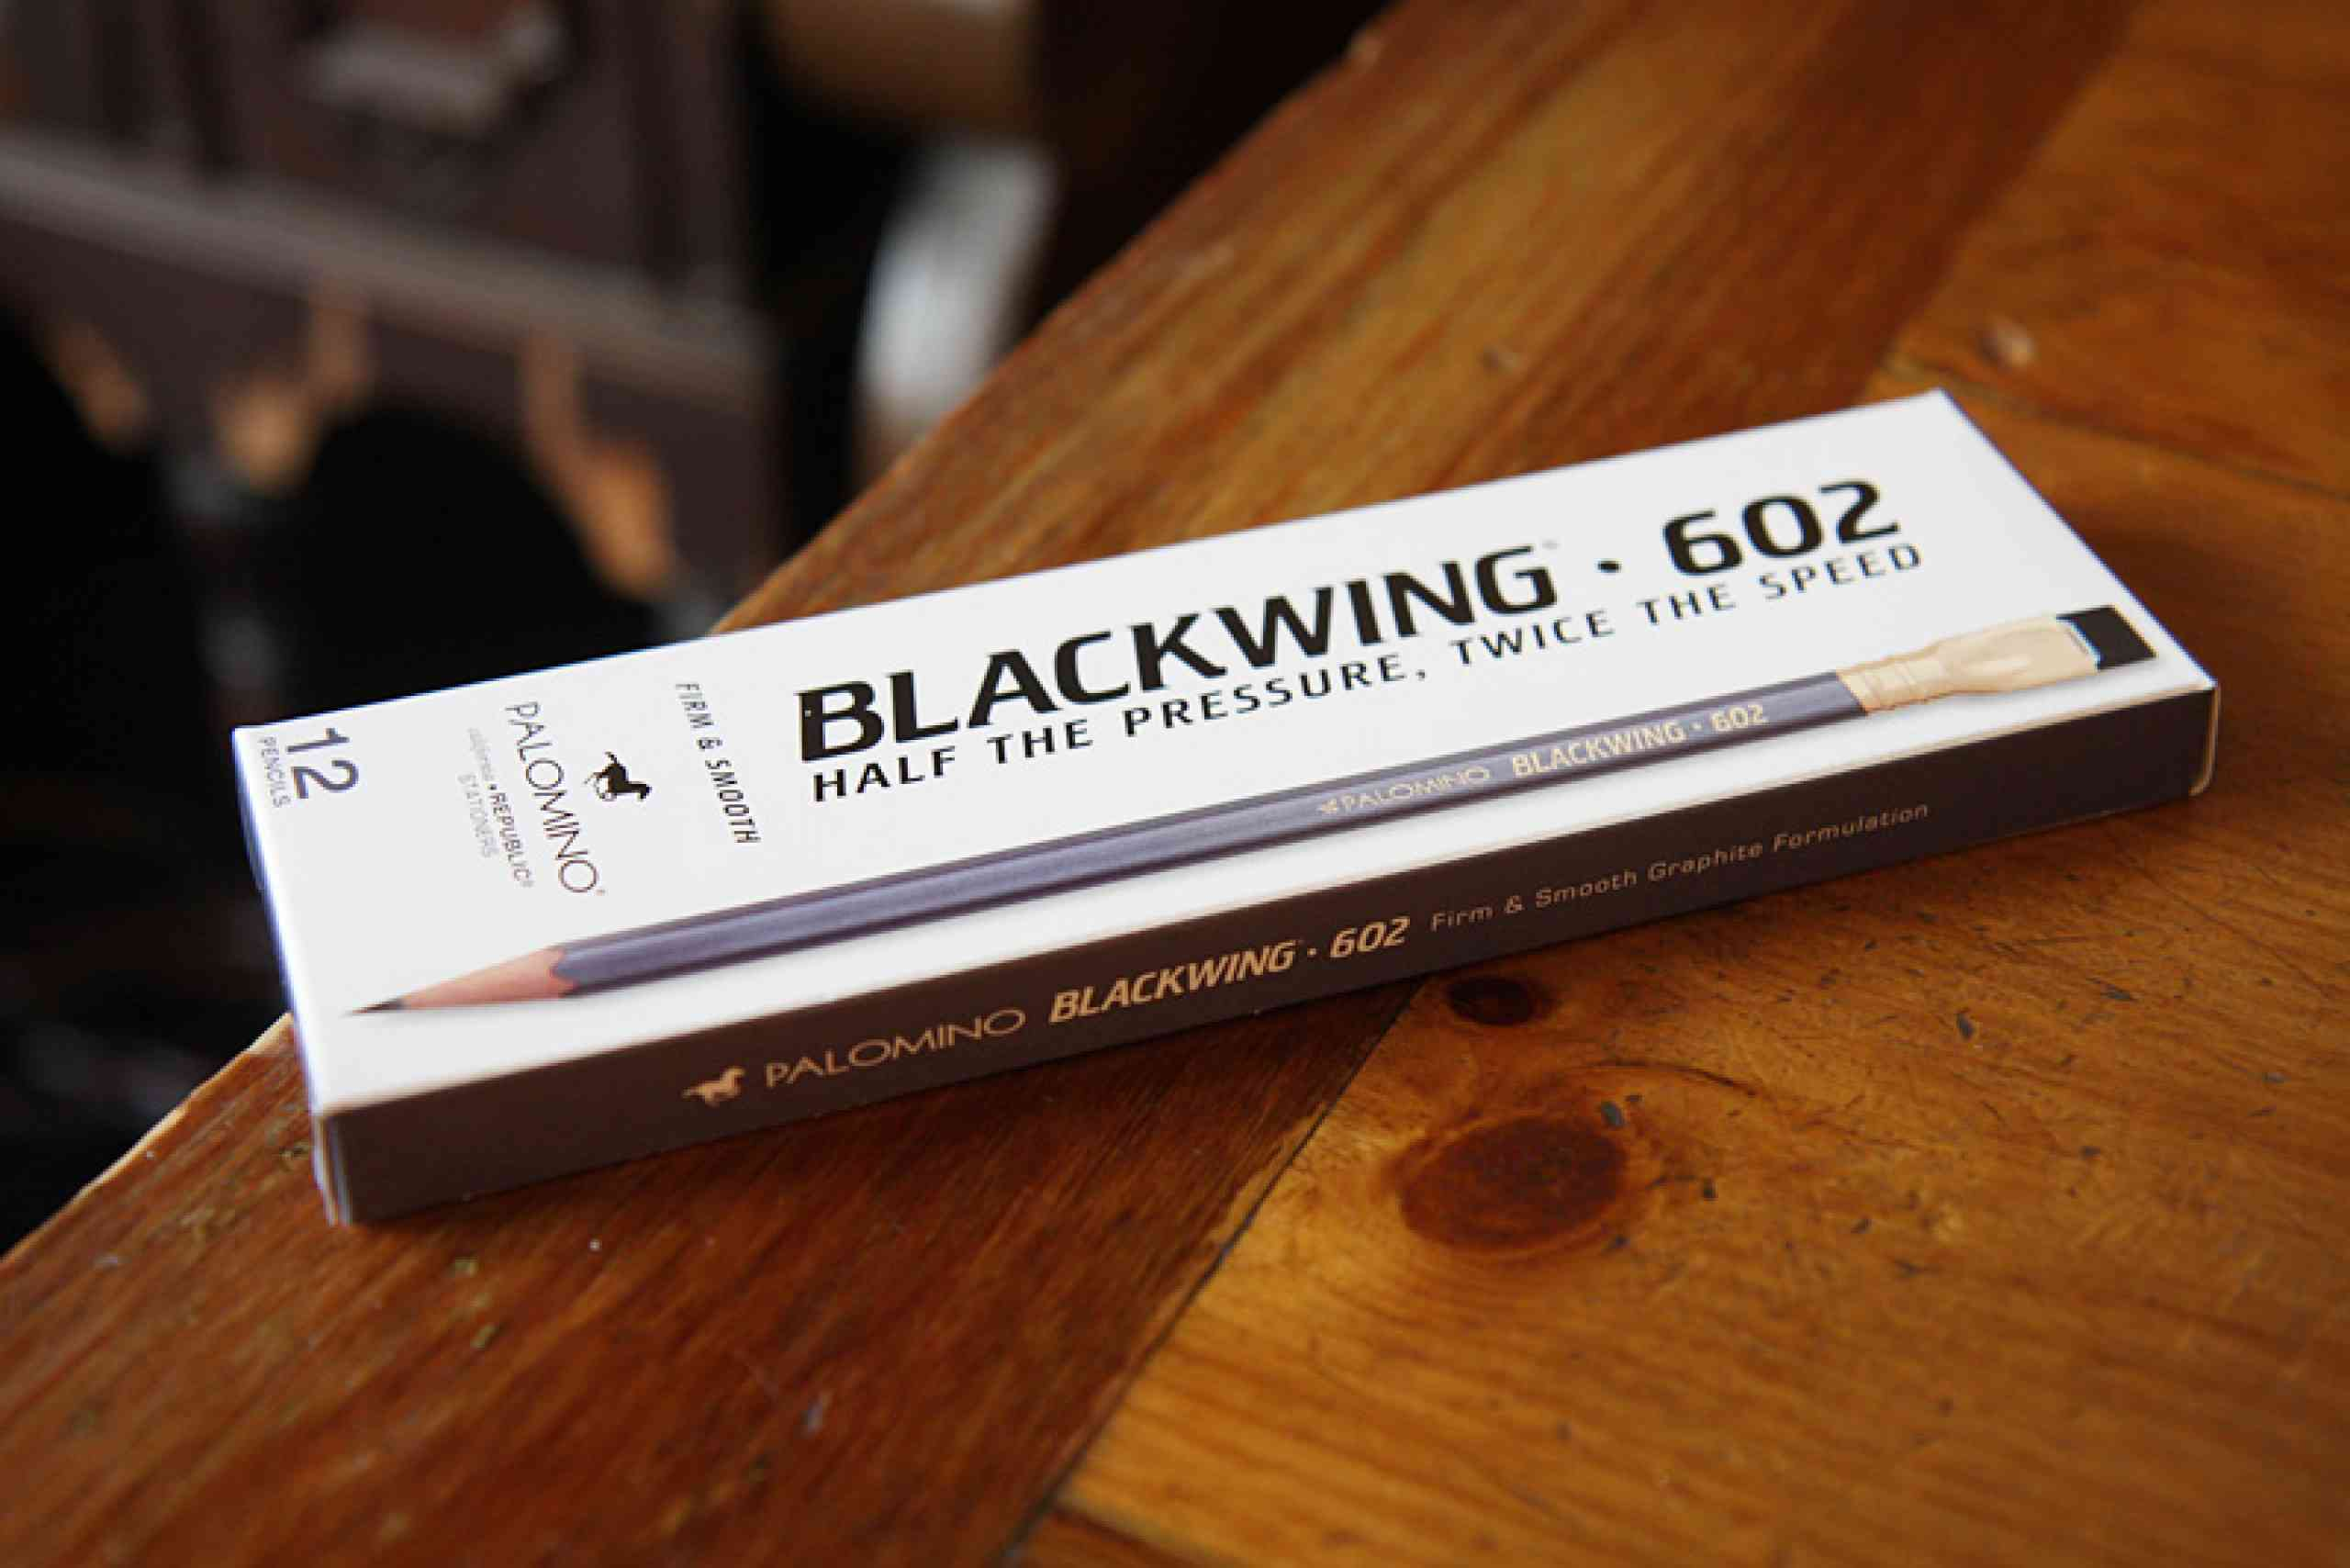 PalominoBlackwing602